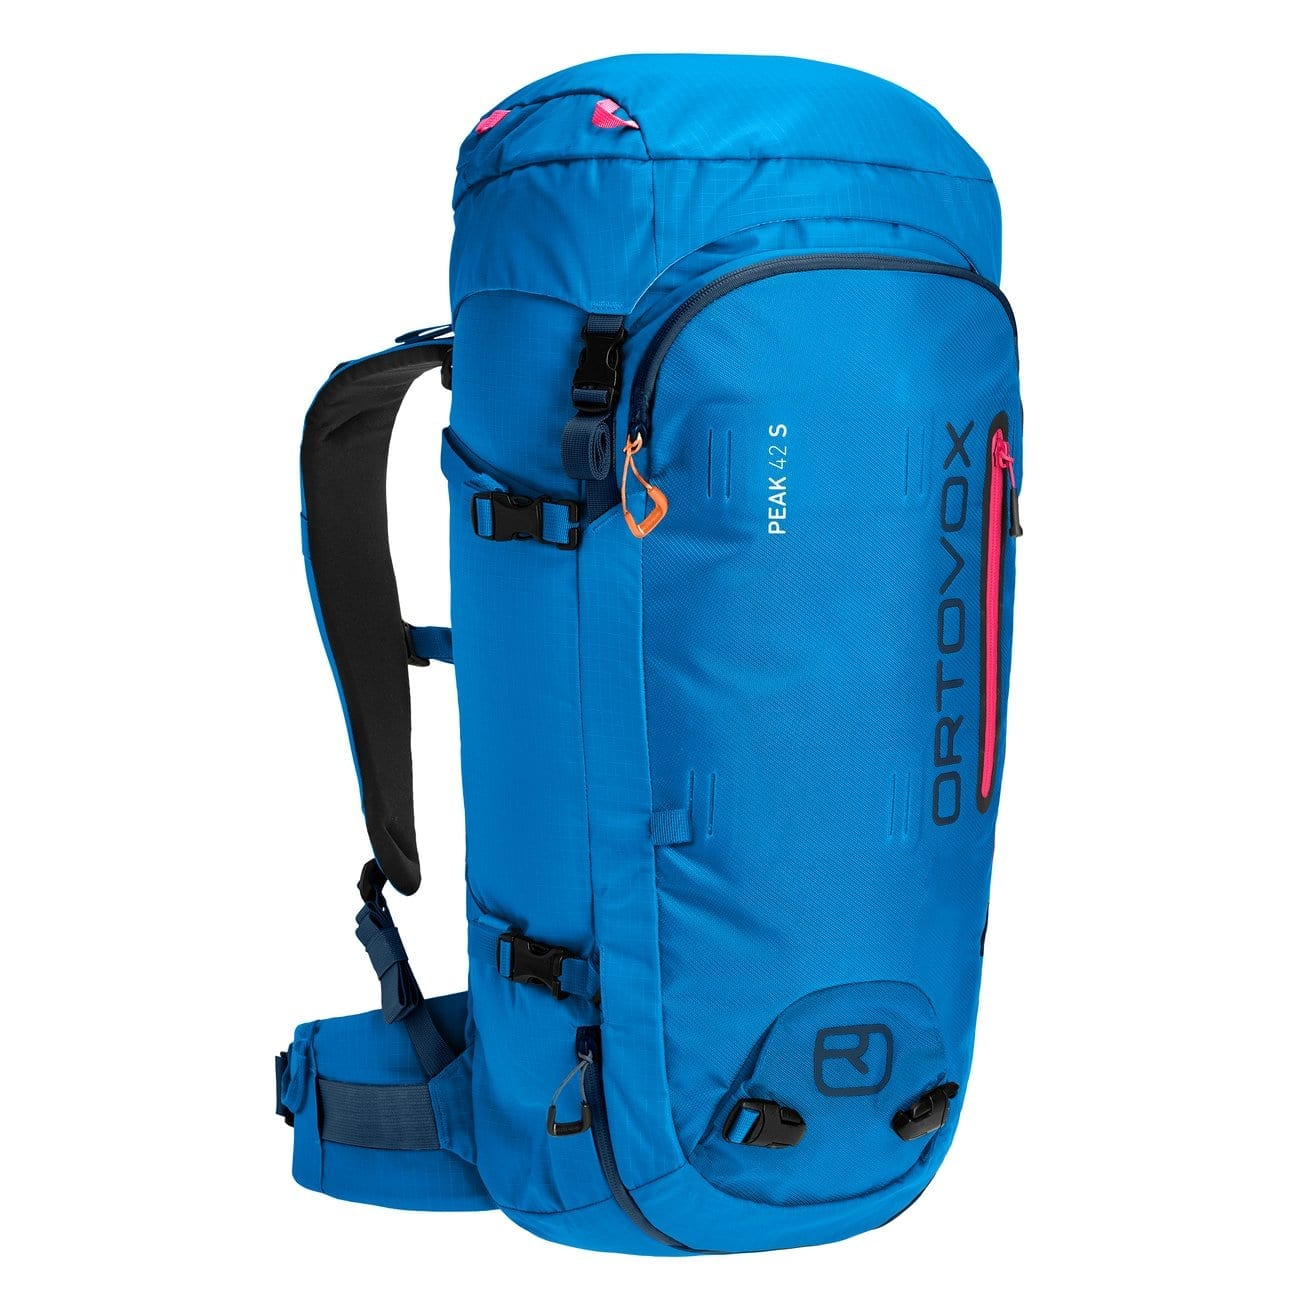 Ortovox Peak 42 S - Safety Blue